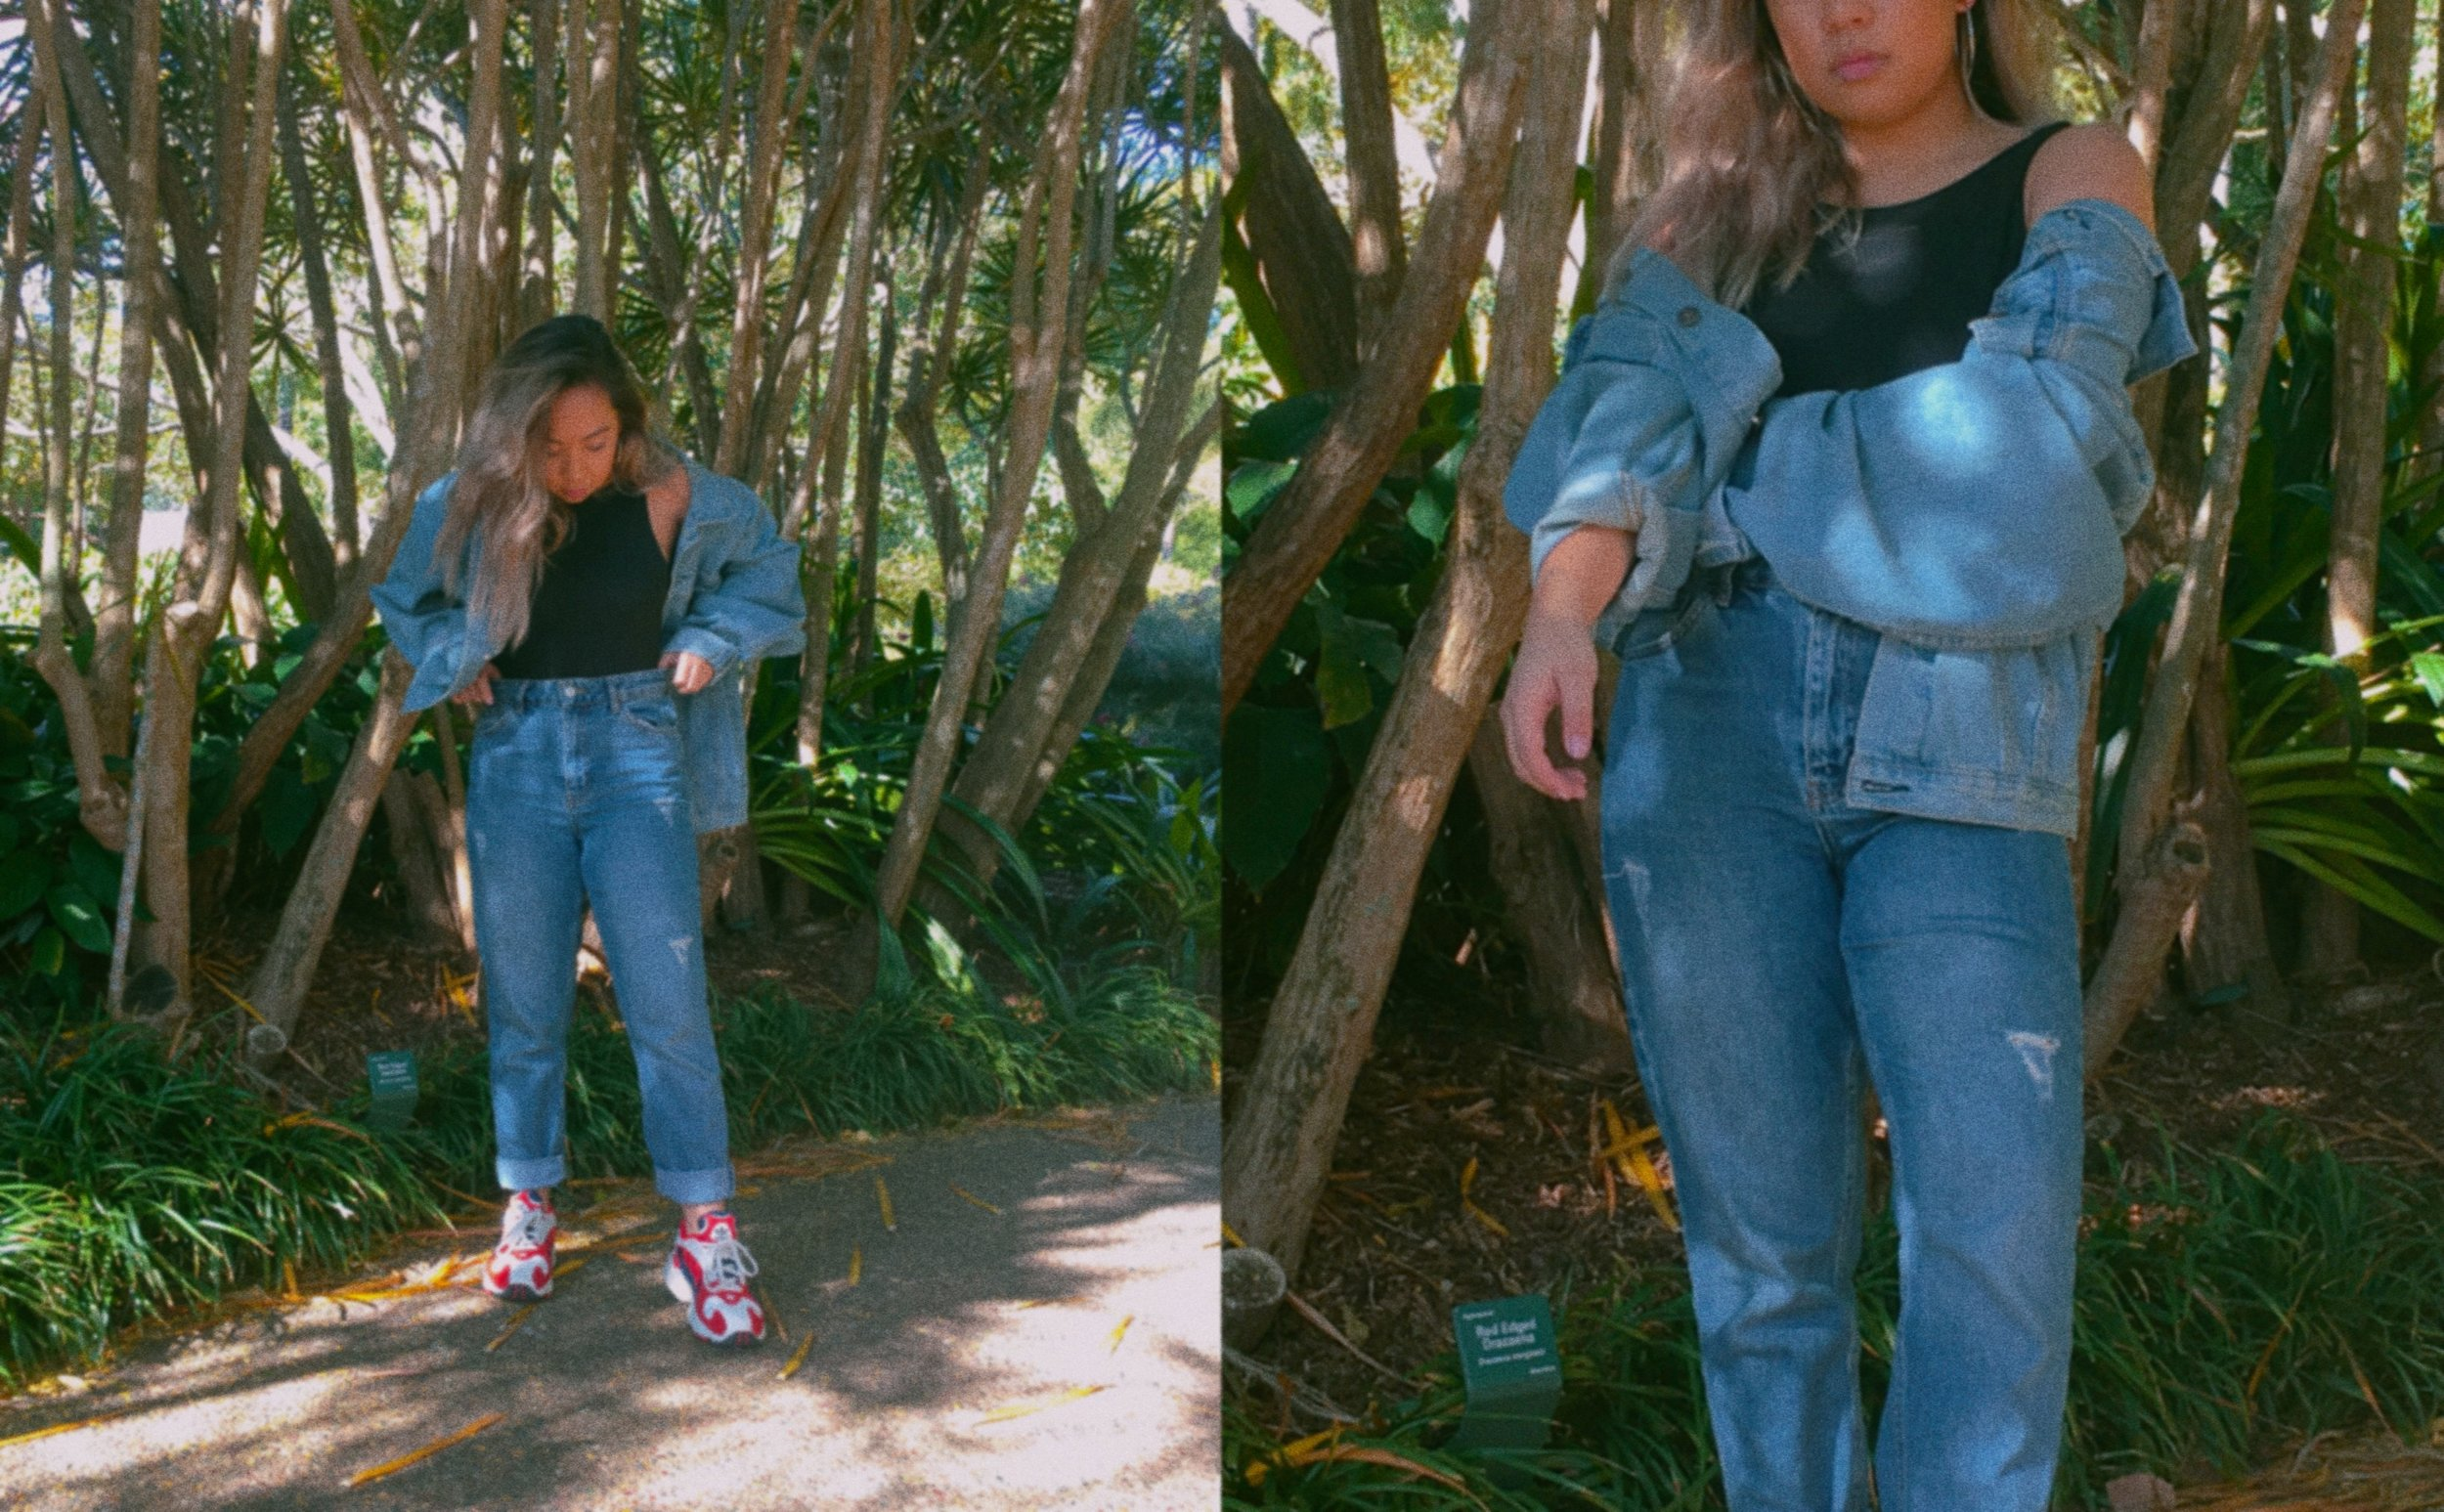 Jacket //  Princess Polly Western Denim Jacket  Jeans //  Topshop Mom Jeans  Bodysuit // Cotton On  (Similar Item)